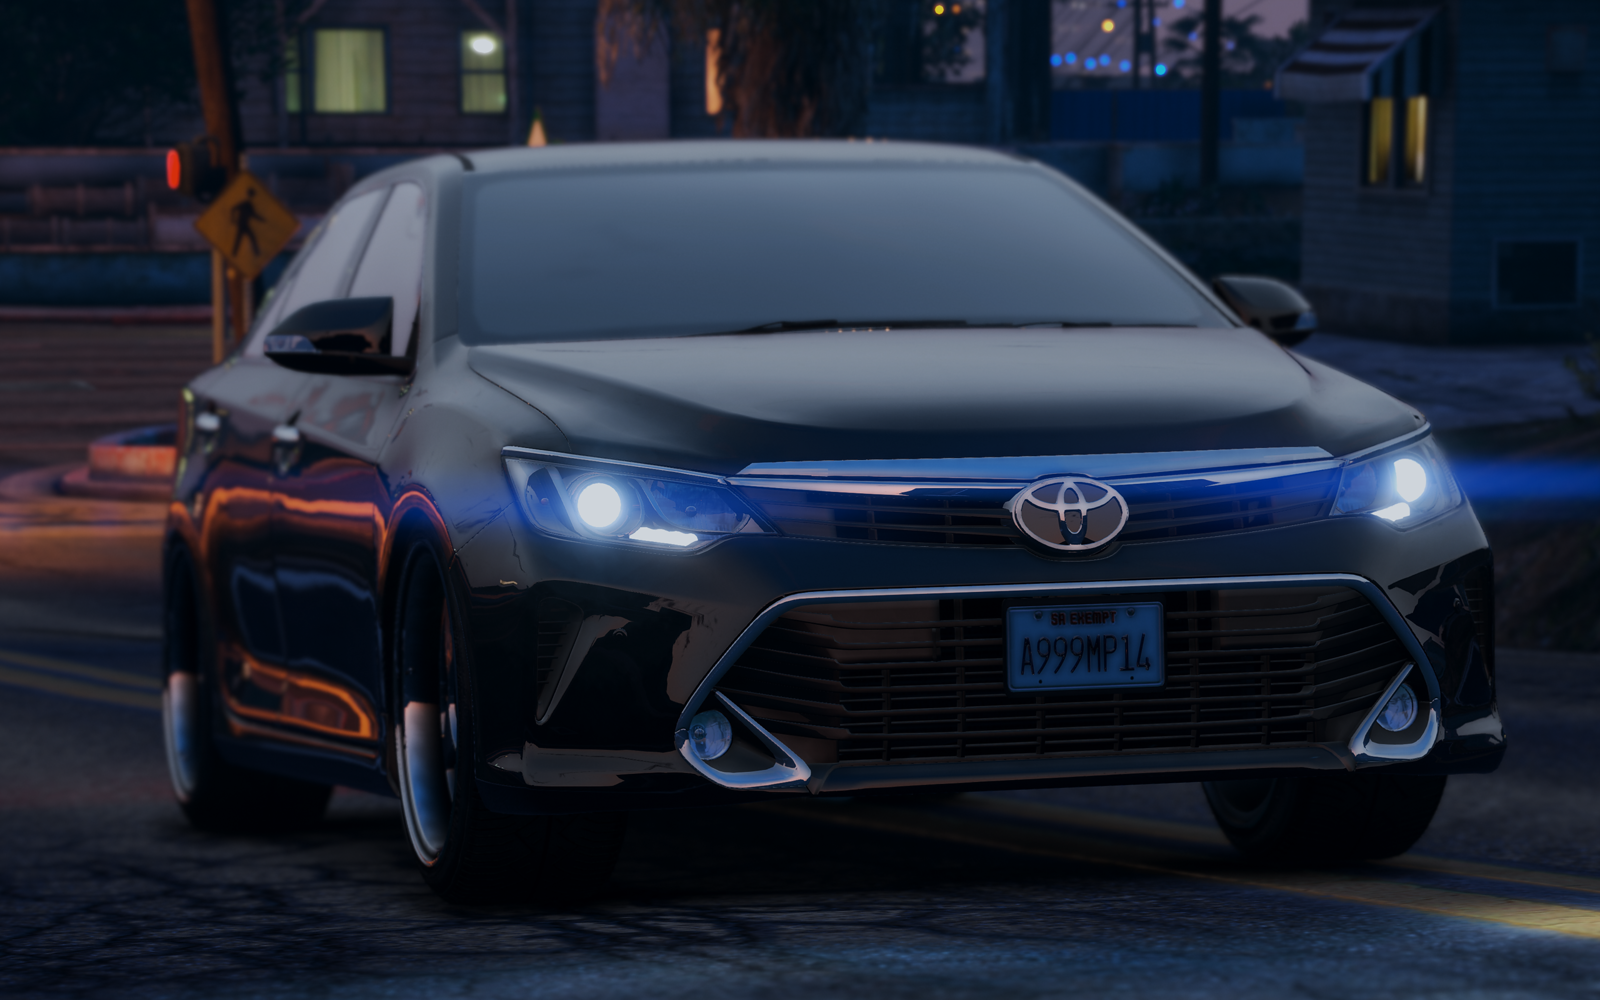 Toyota Camry 2016 [Add-On / Replace] - GTA5-Mods.com